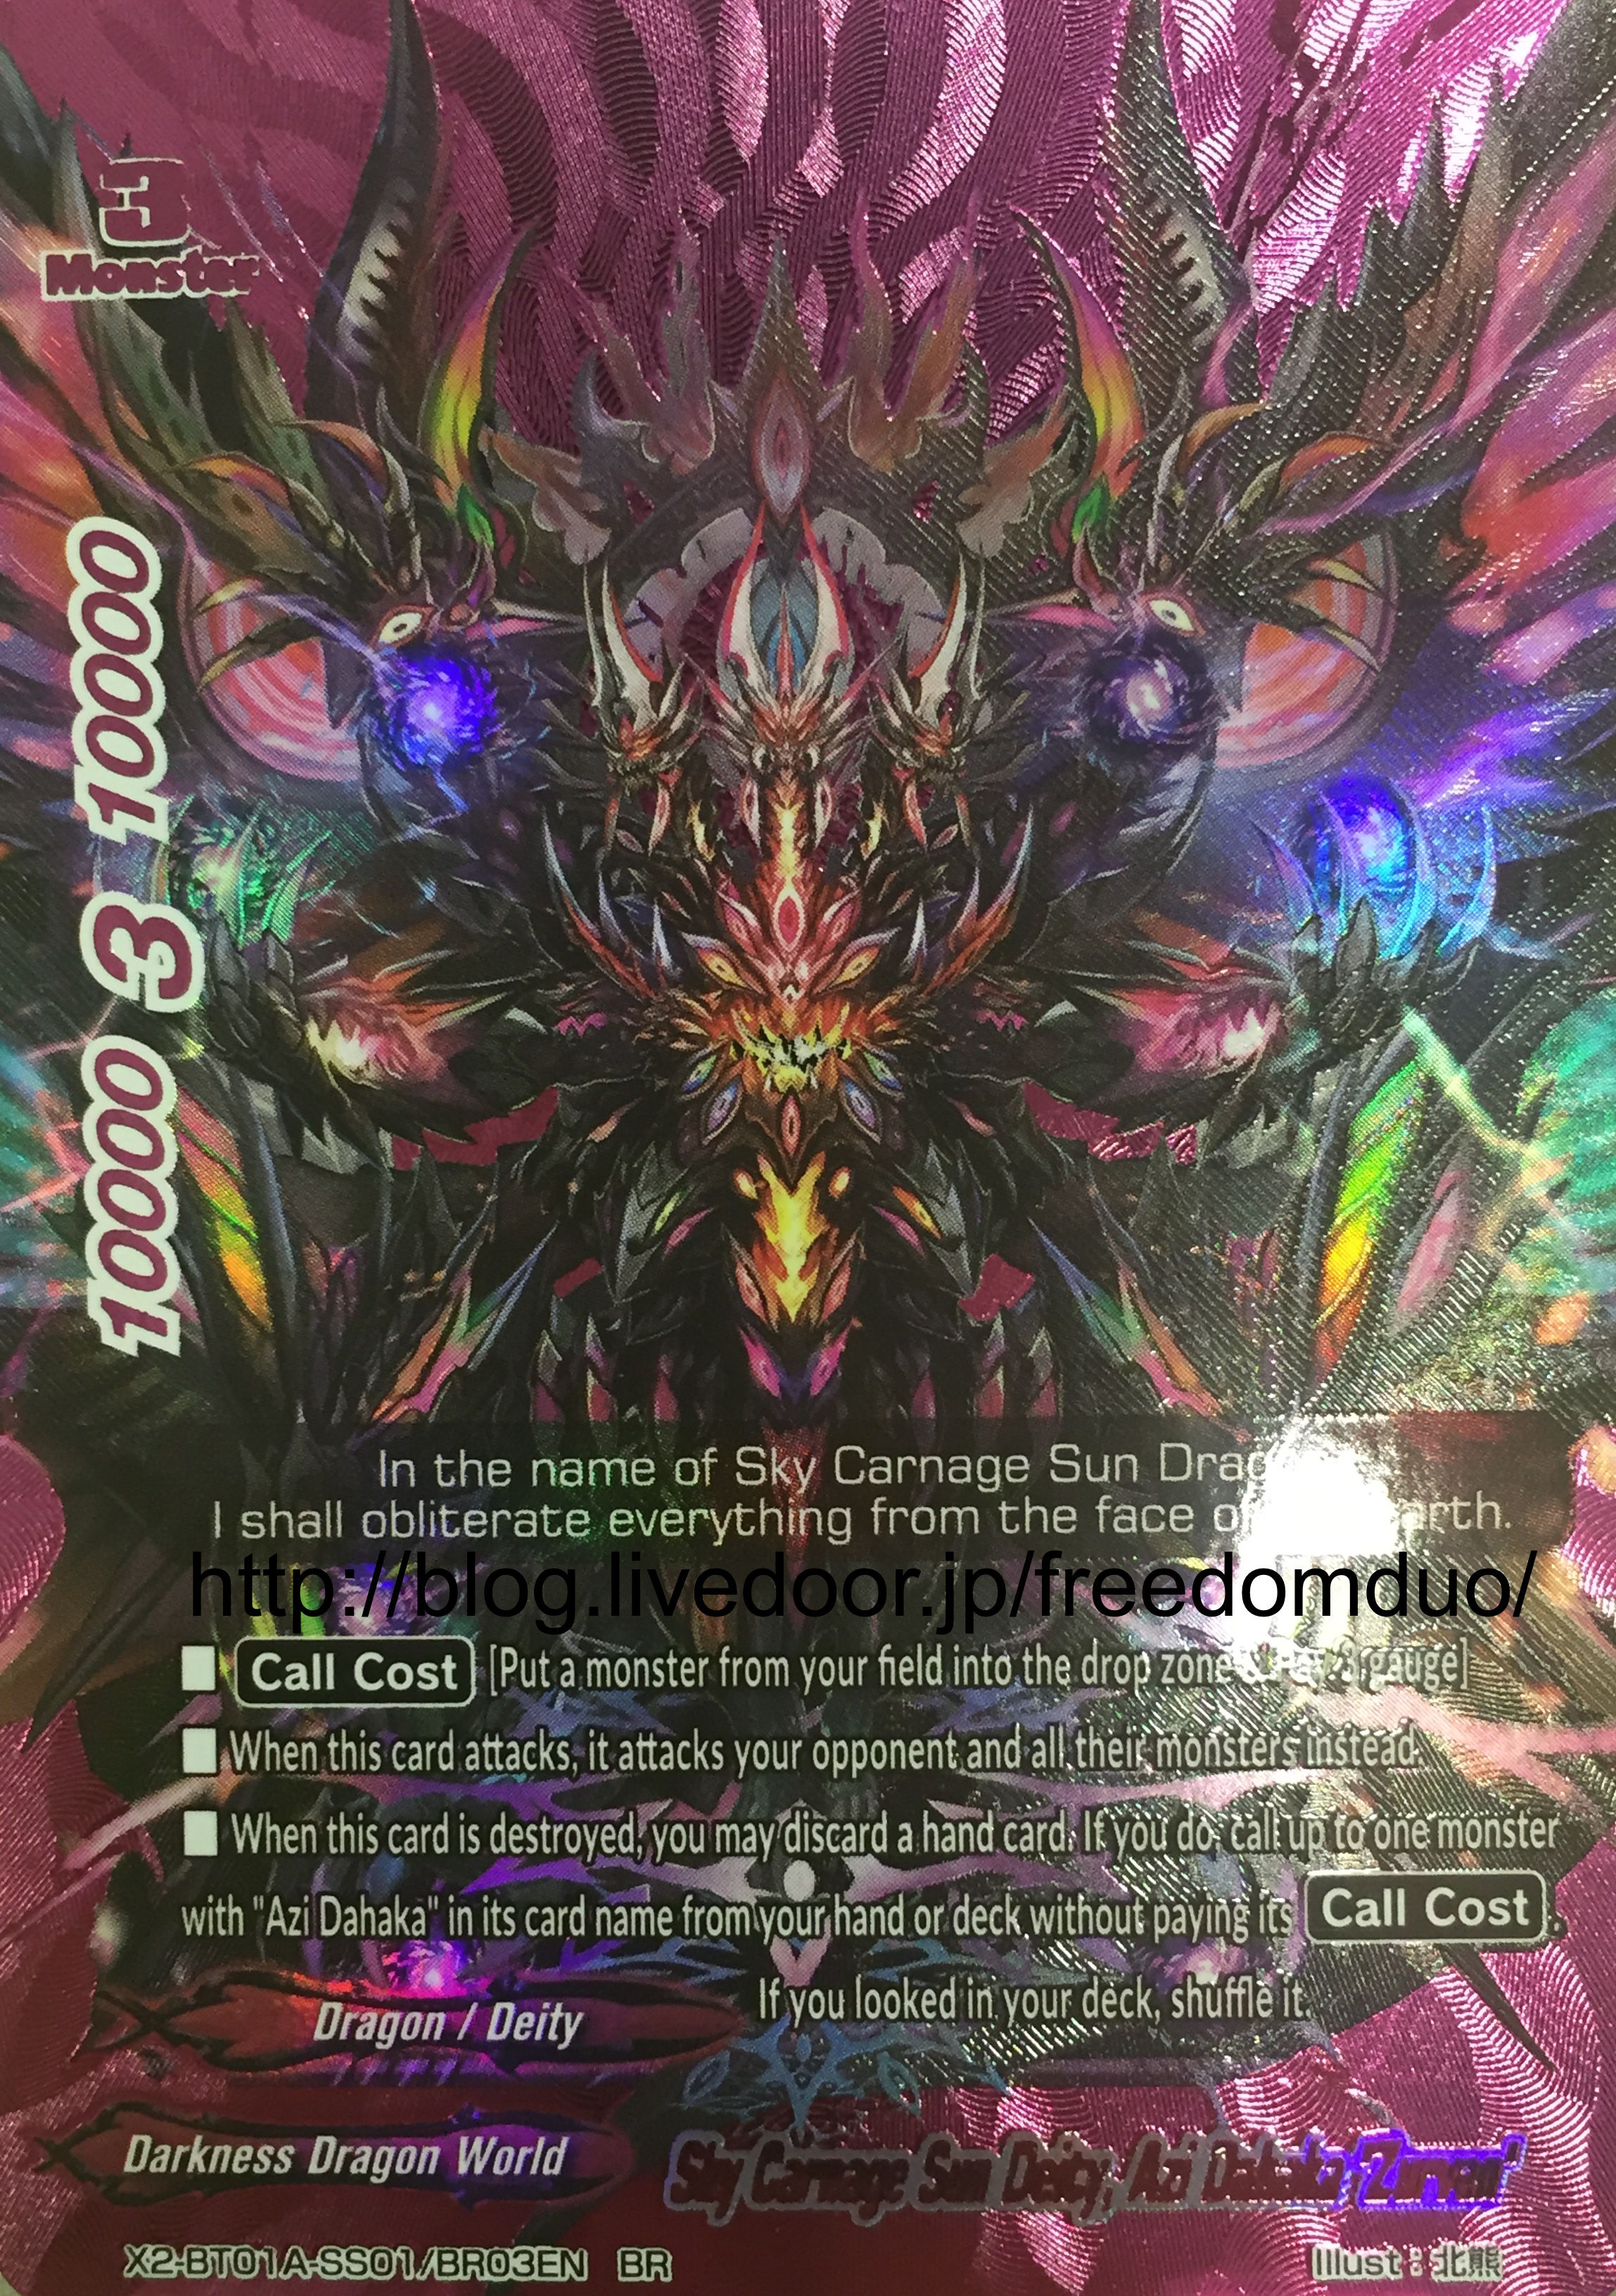 FUTURE CARD BUDDYFIGHT SKY CARNAGE DEITY AZI DAHAKA ZURVAN X2-BT01A SECRET SET